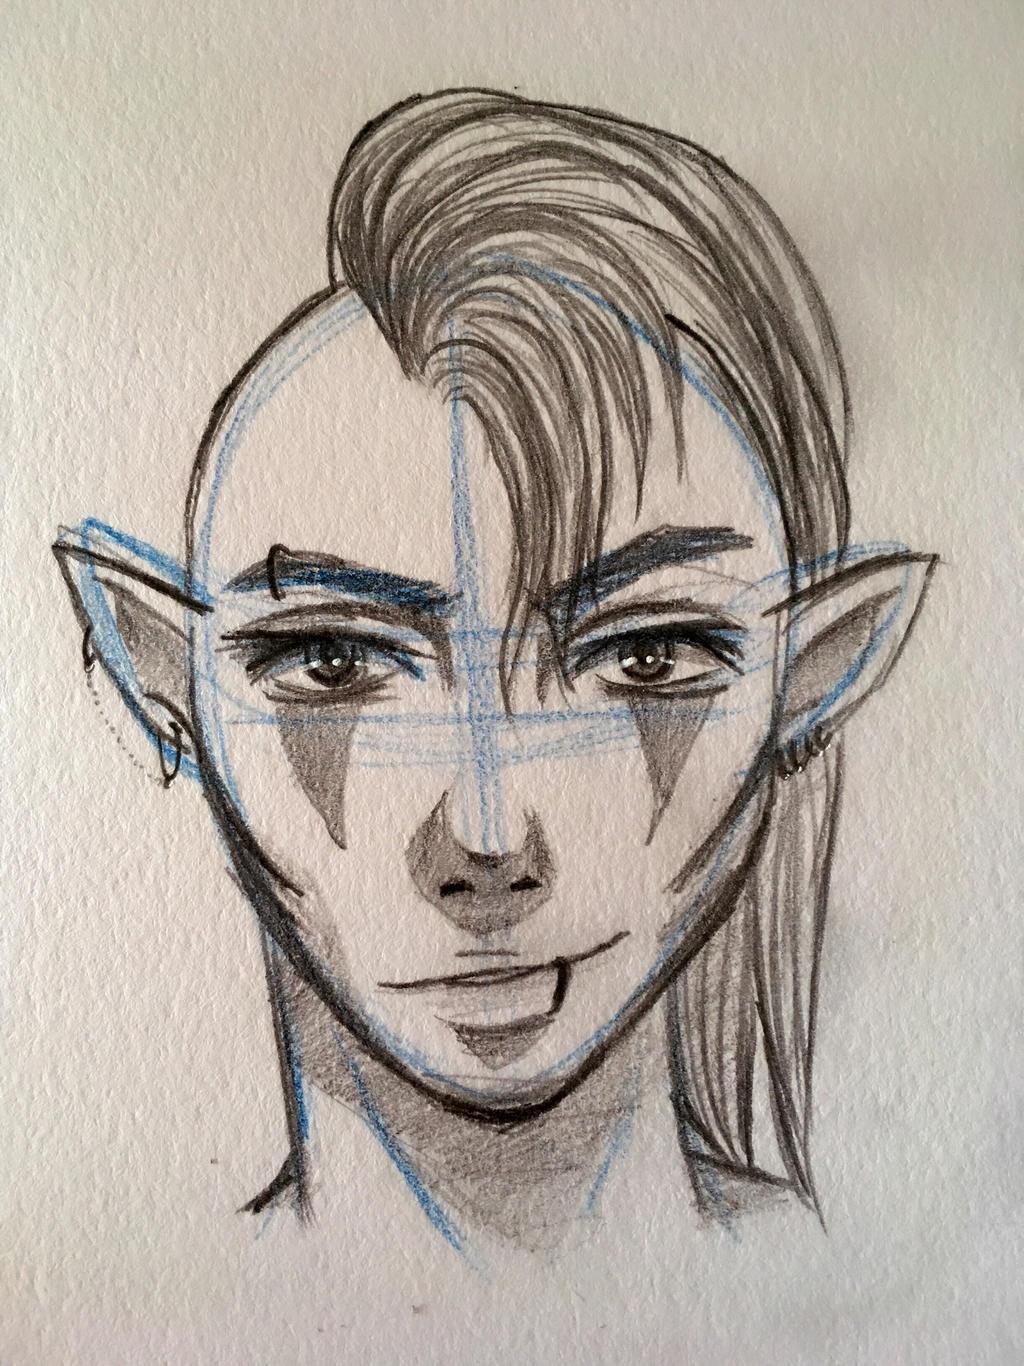 Sketch Of An Oc Male Elf By Kitsunemiyagi On Deviantart